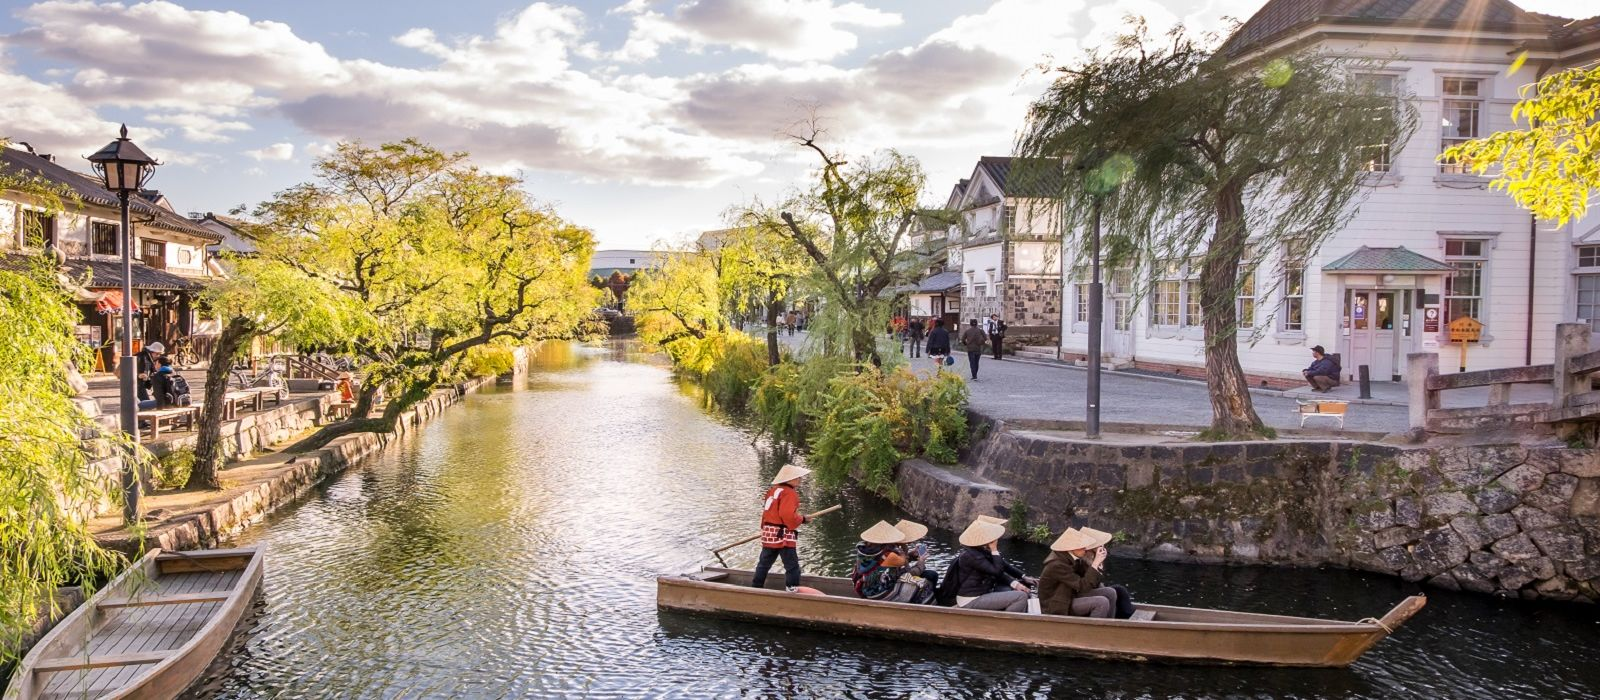 Japan's Hidden Treasures Tour Trip 7